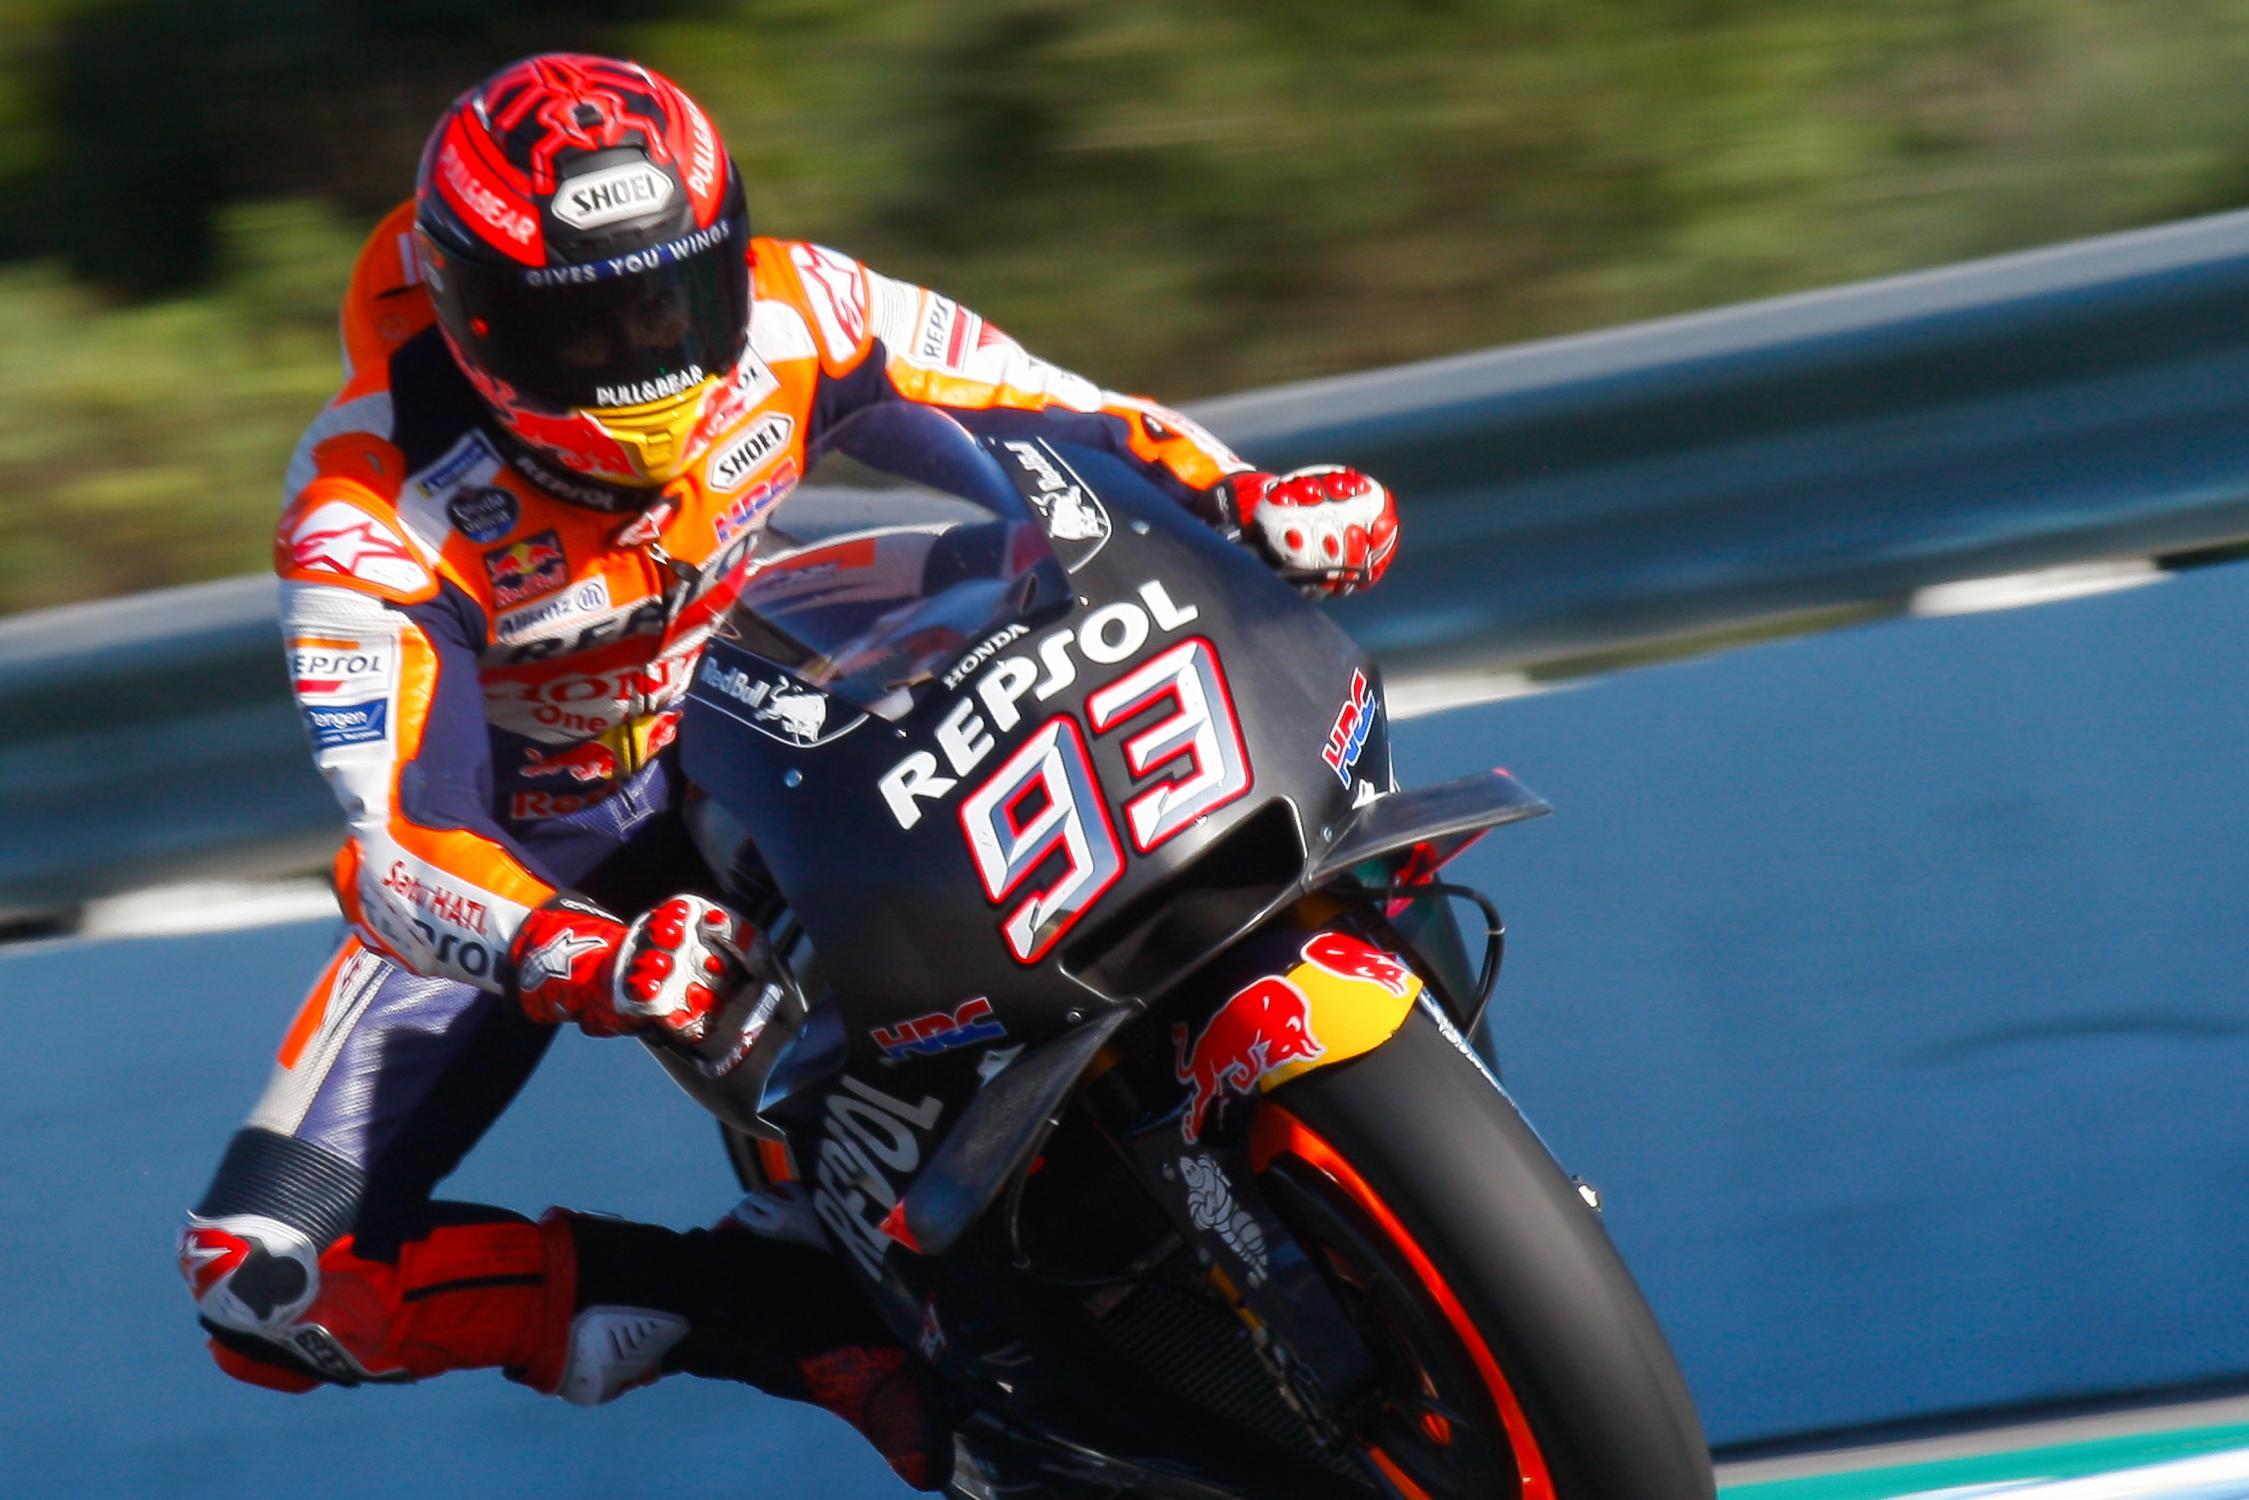 MotoGP – Marquez happy with Jerez test results